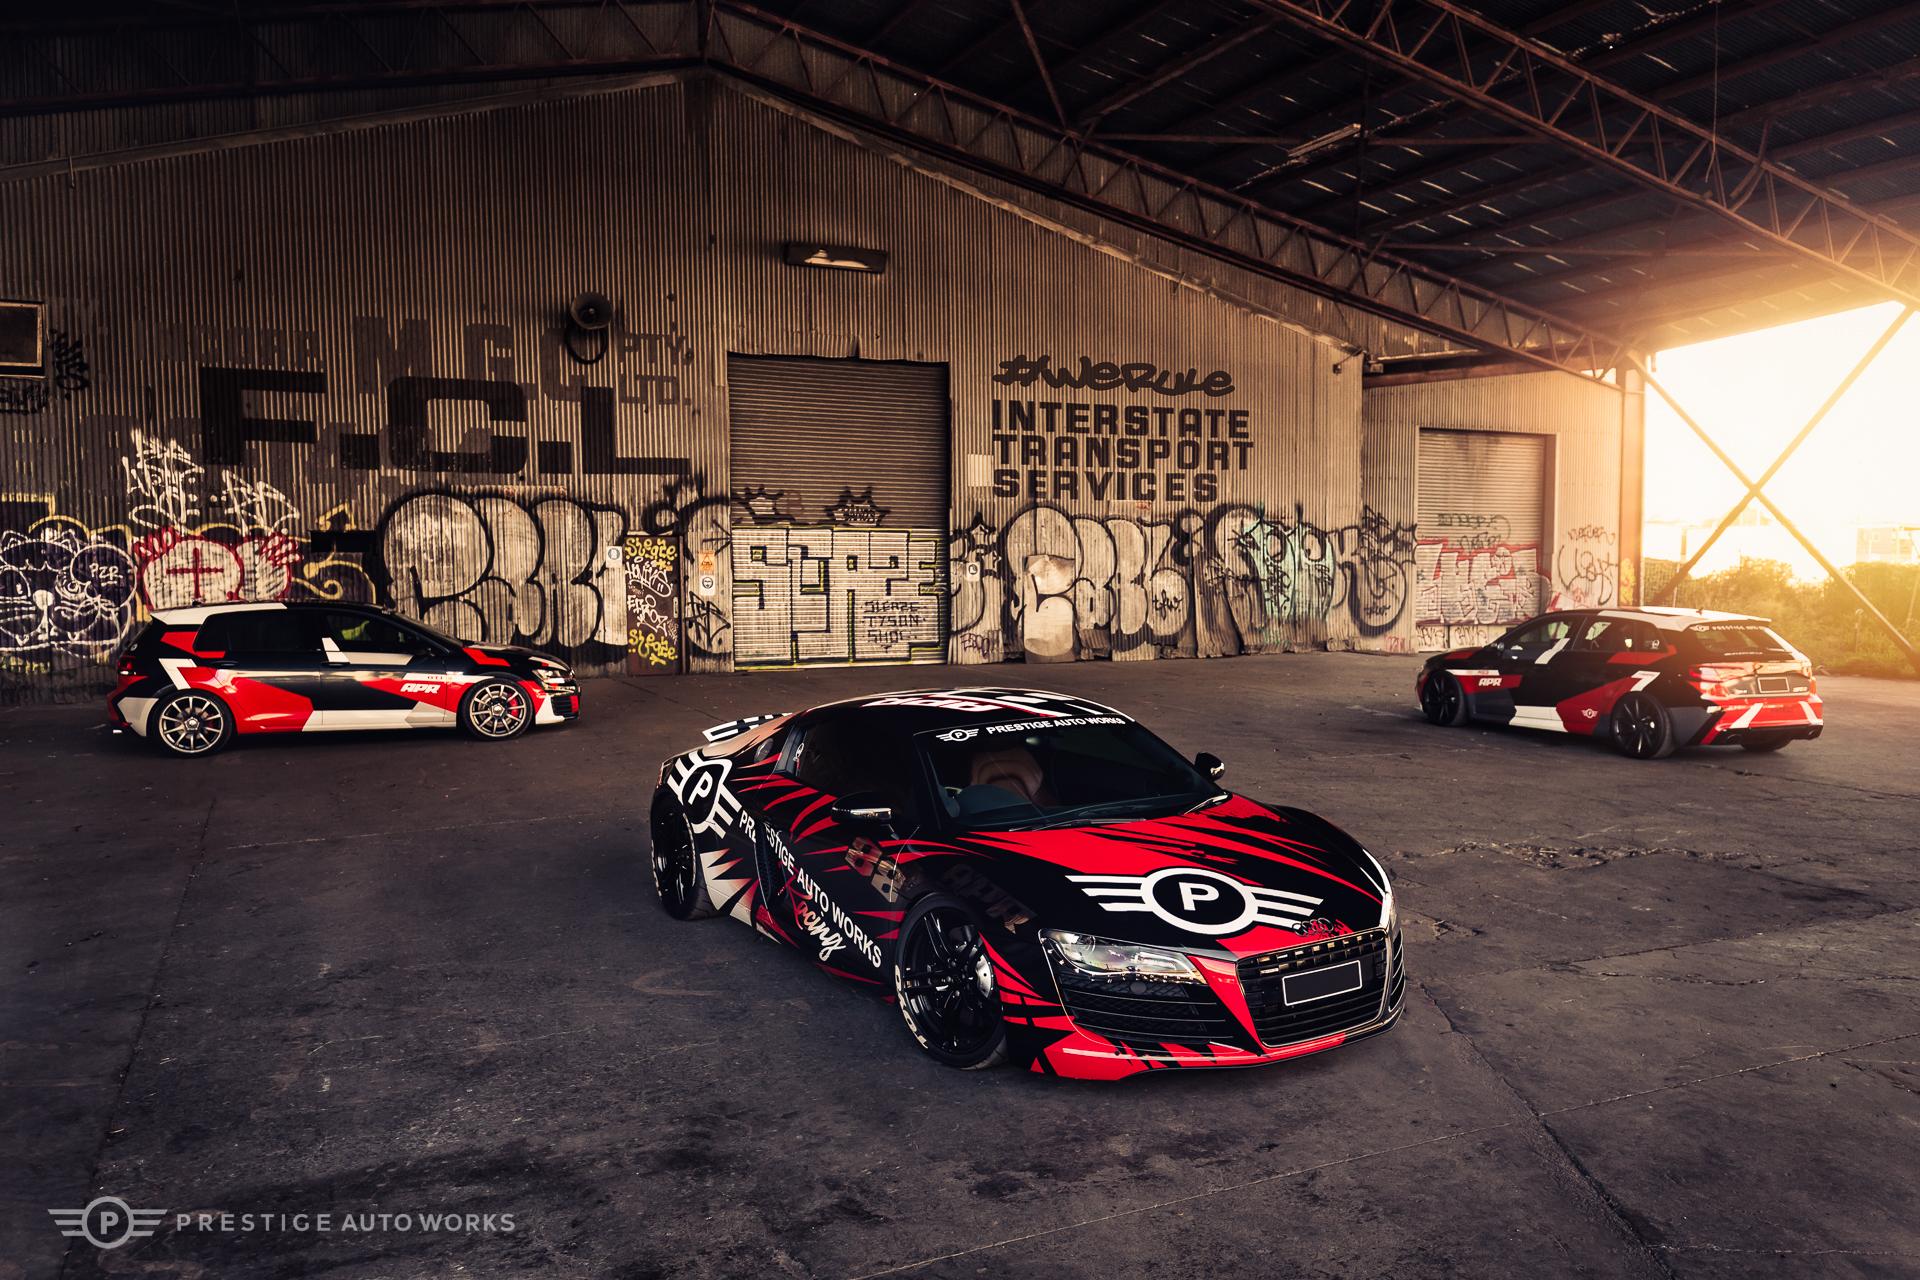 Melbourne Car Photographer | Vinhman Photo